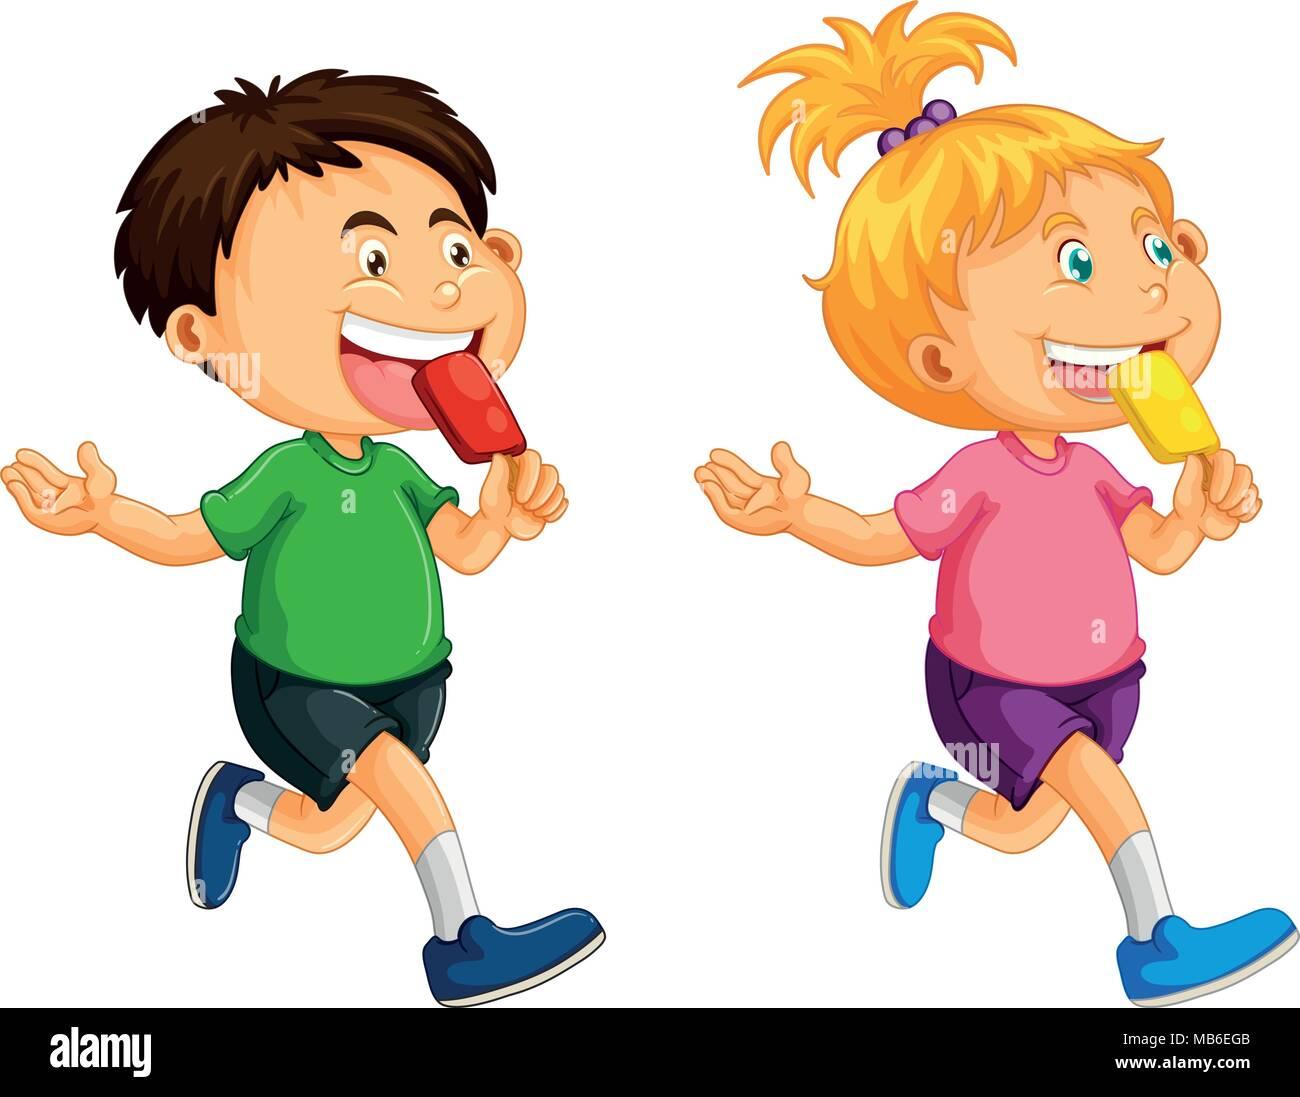 Boy and girl eating popsicle illustration Stock Vector Art ...